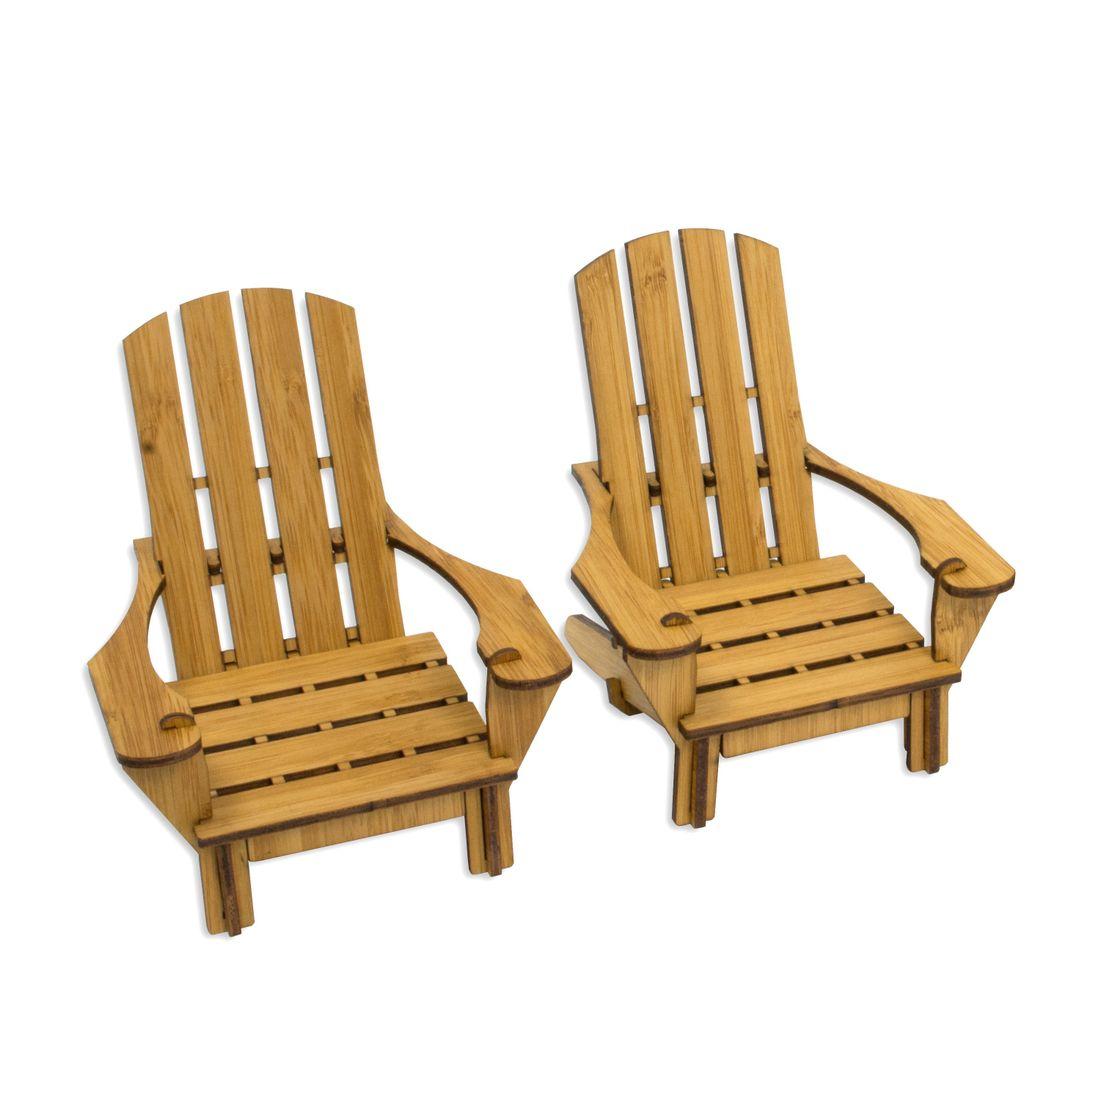 Wooden Adirondack Chair Coasters